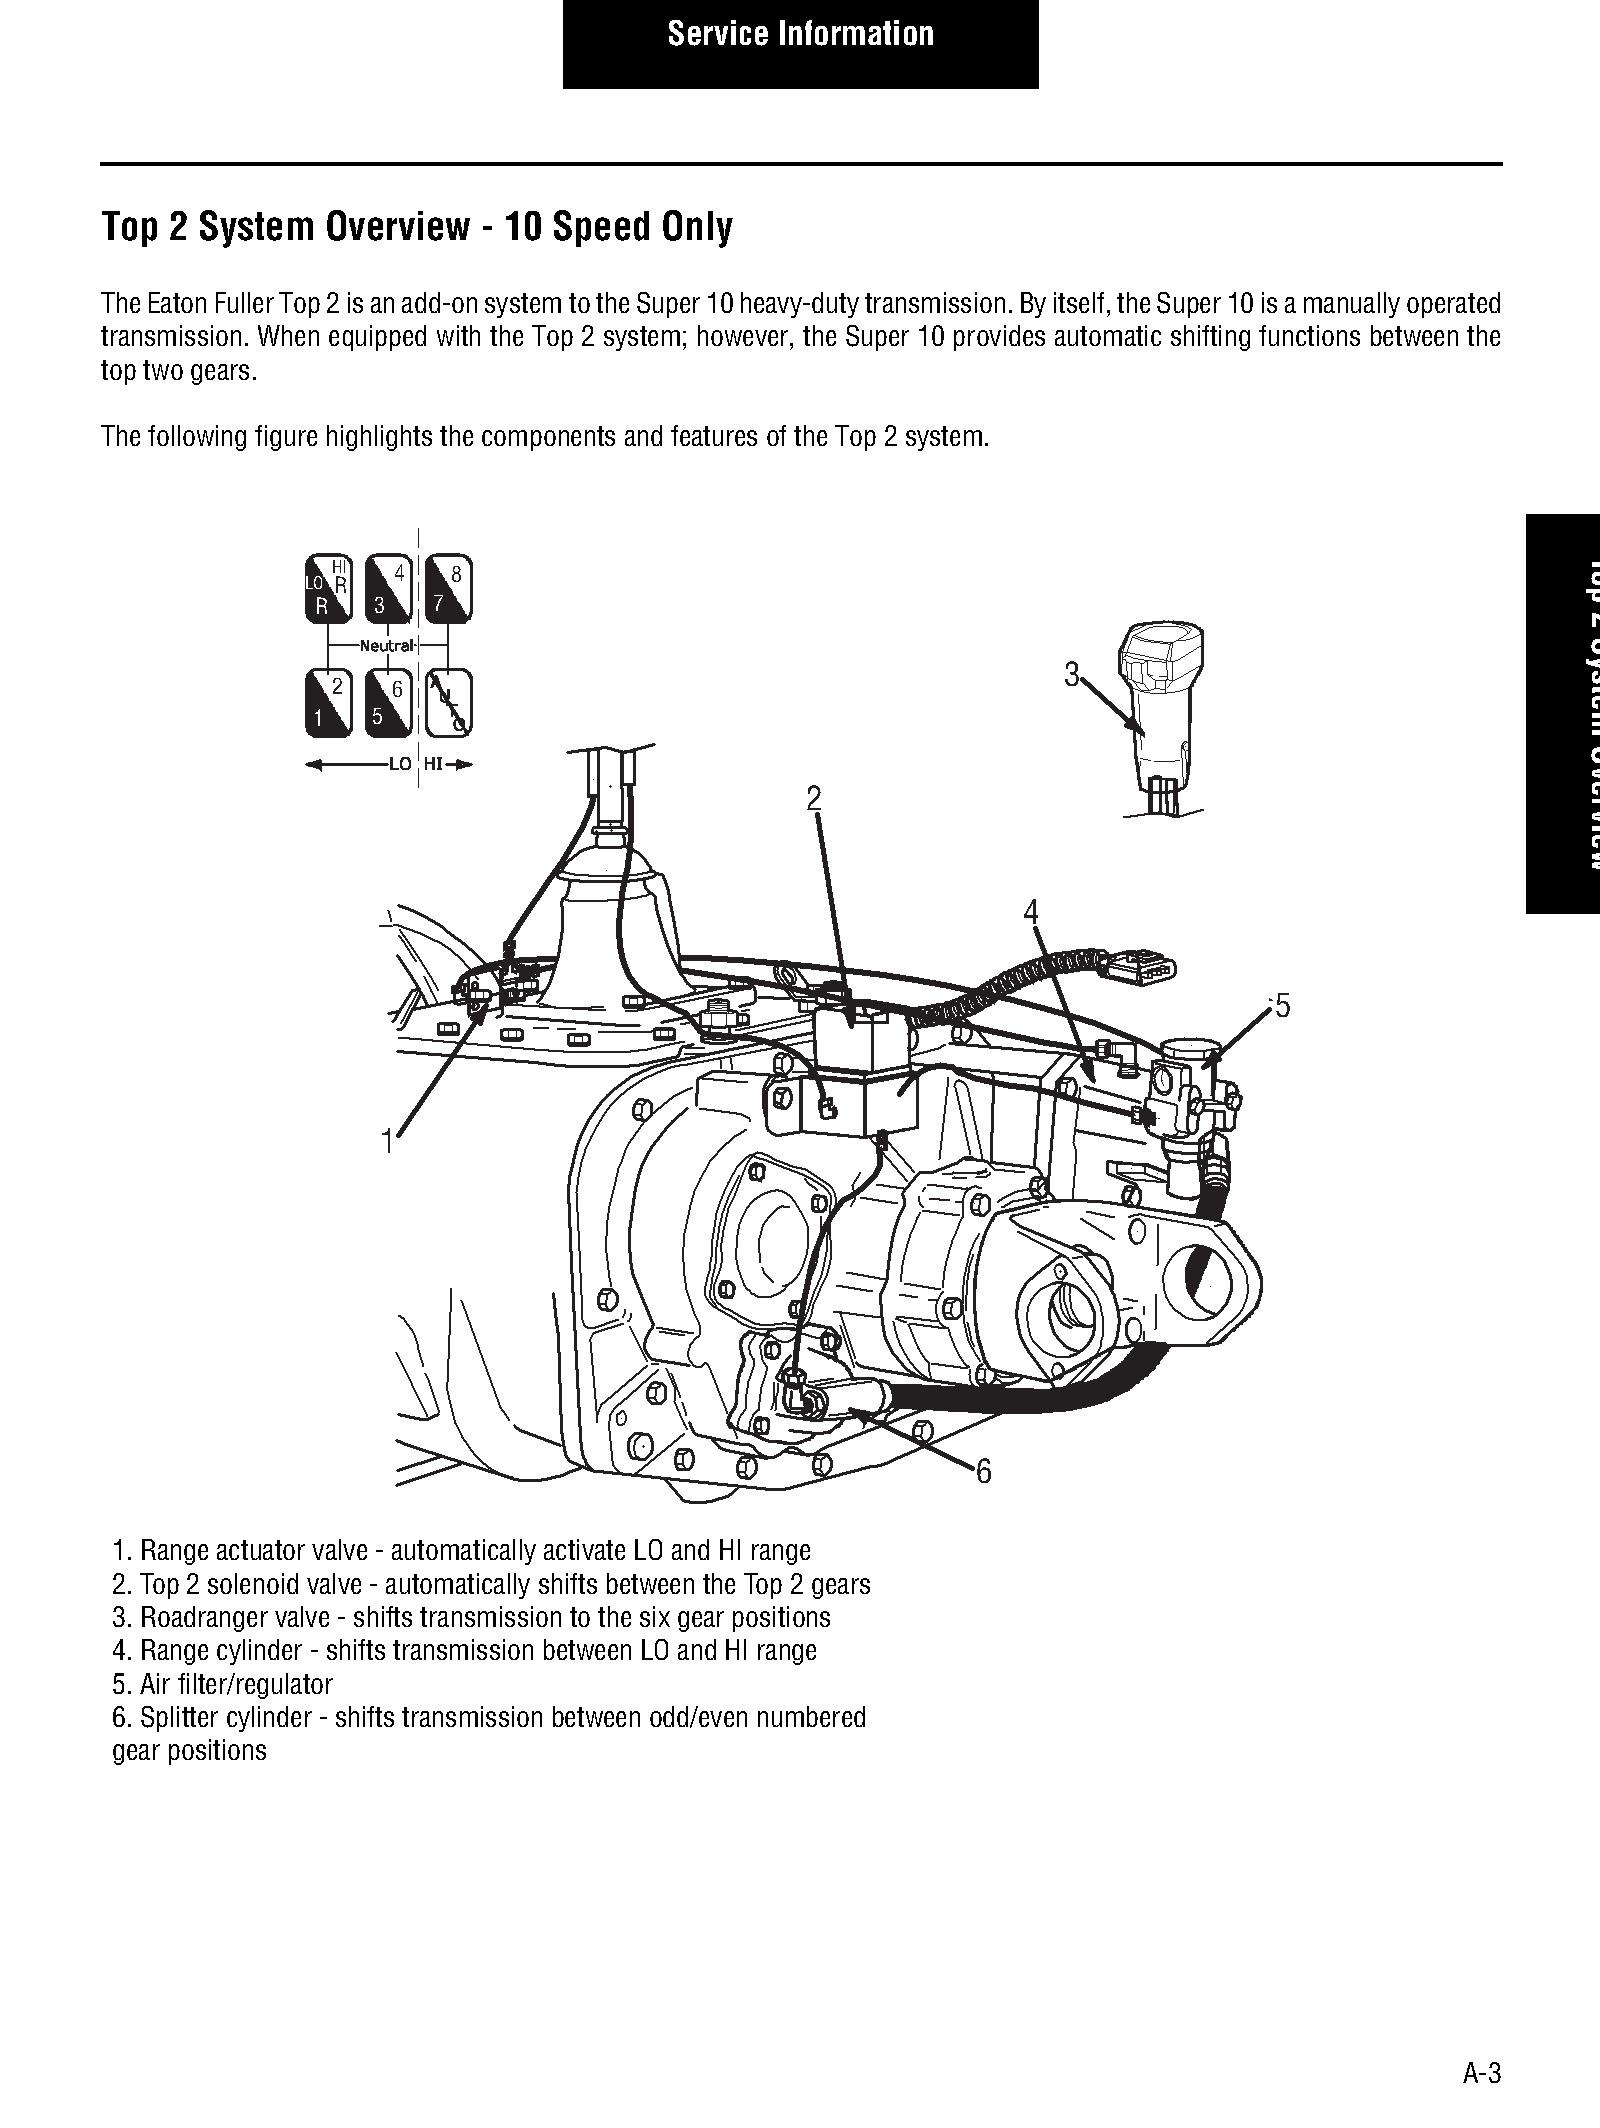 eaton transmission diagram eaton database wiring diagram images 2012 05 04 211846 top 2 schematic